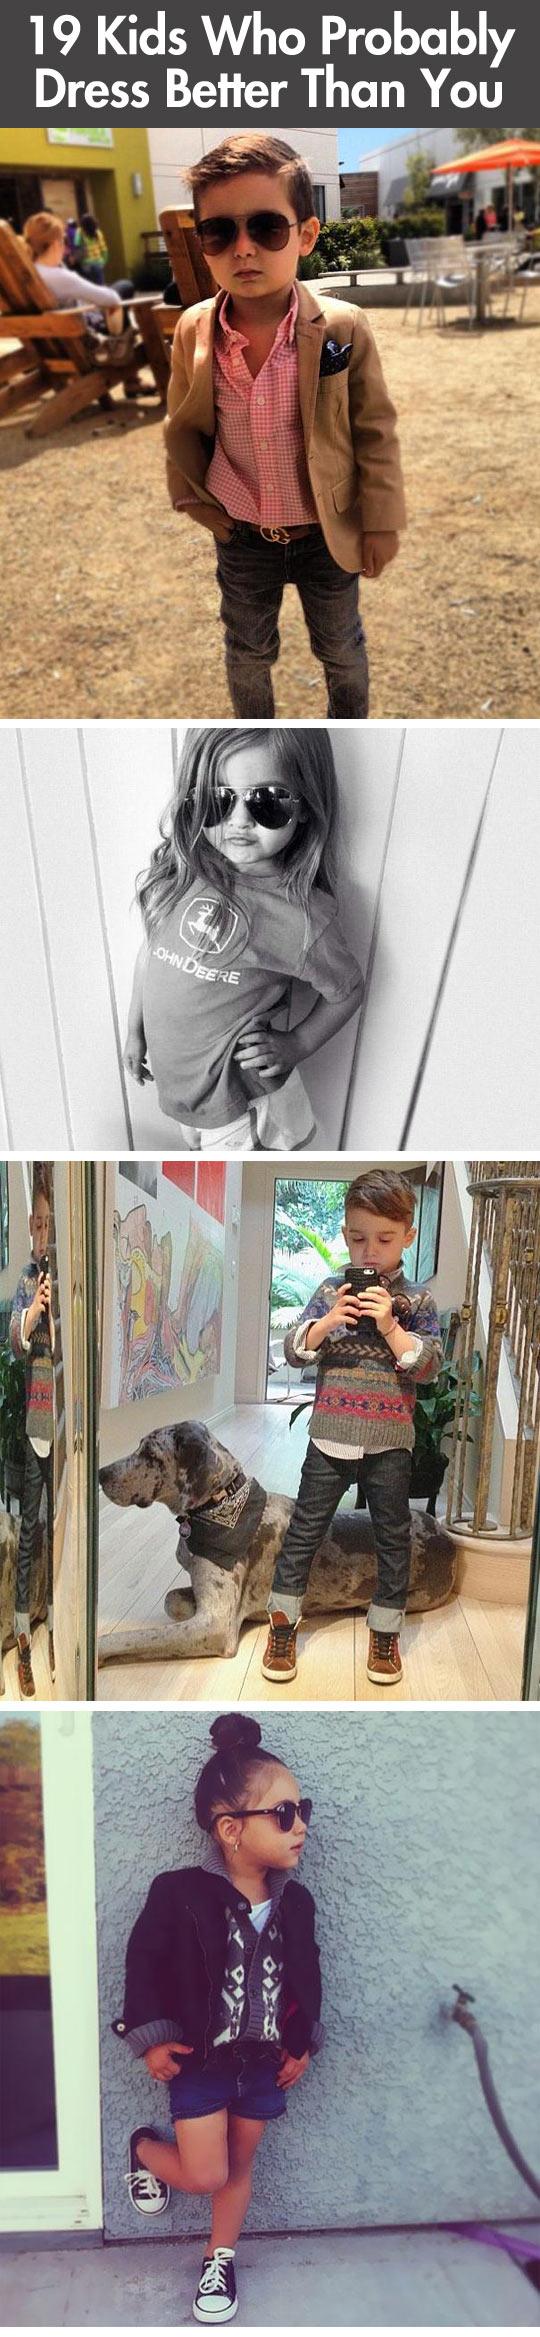 Kids that dress better than you...